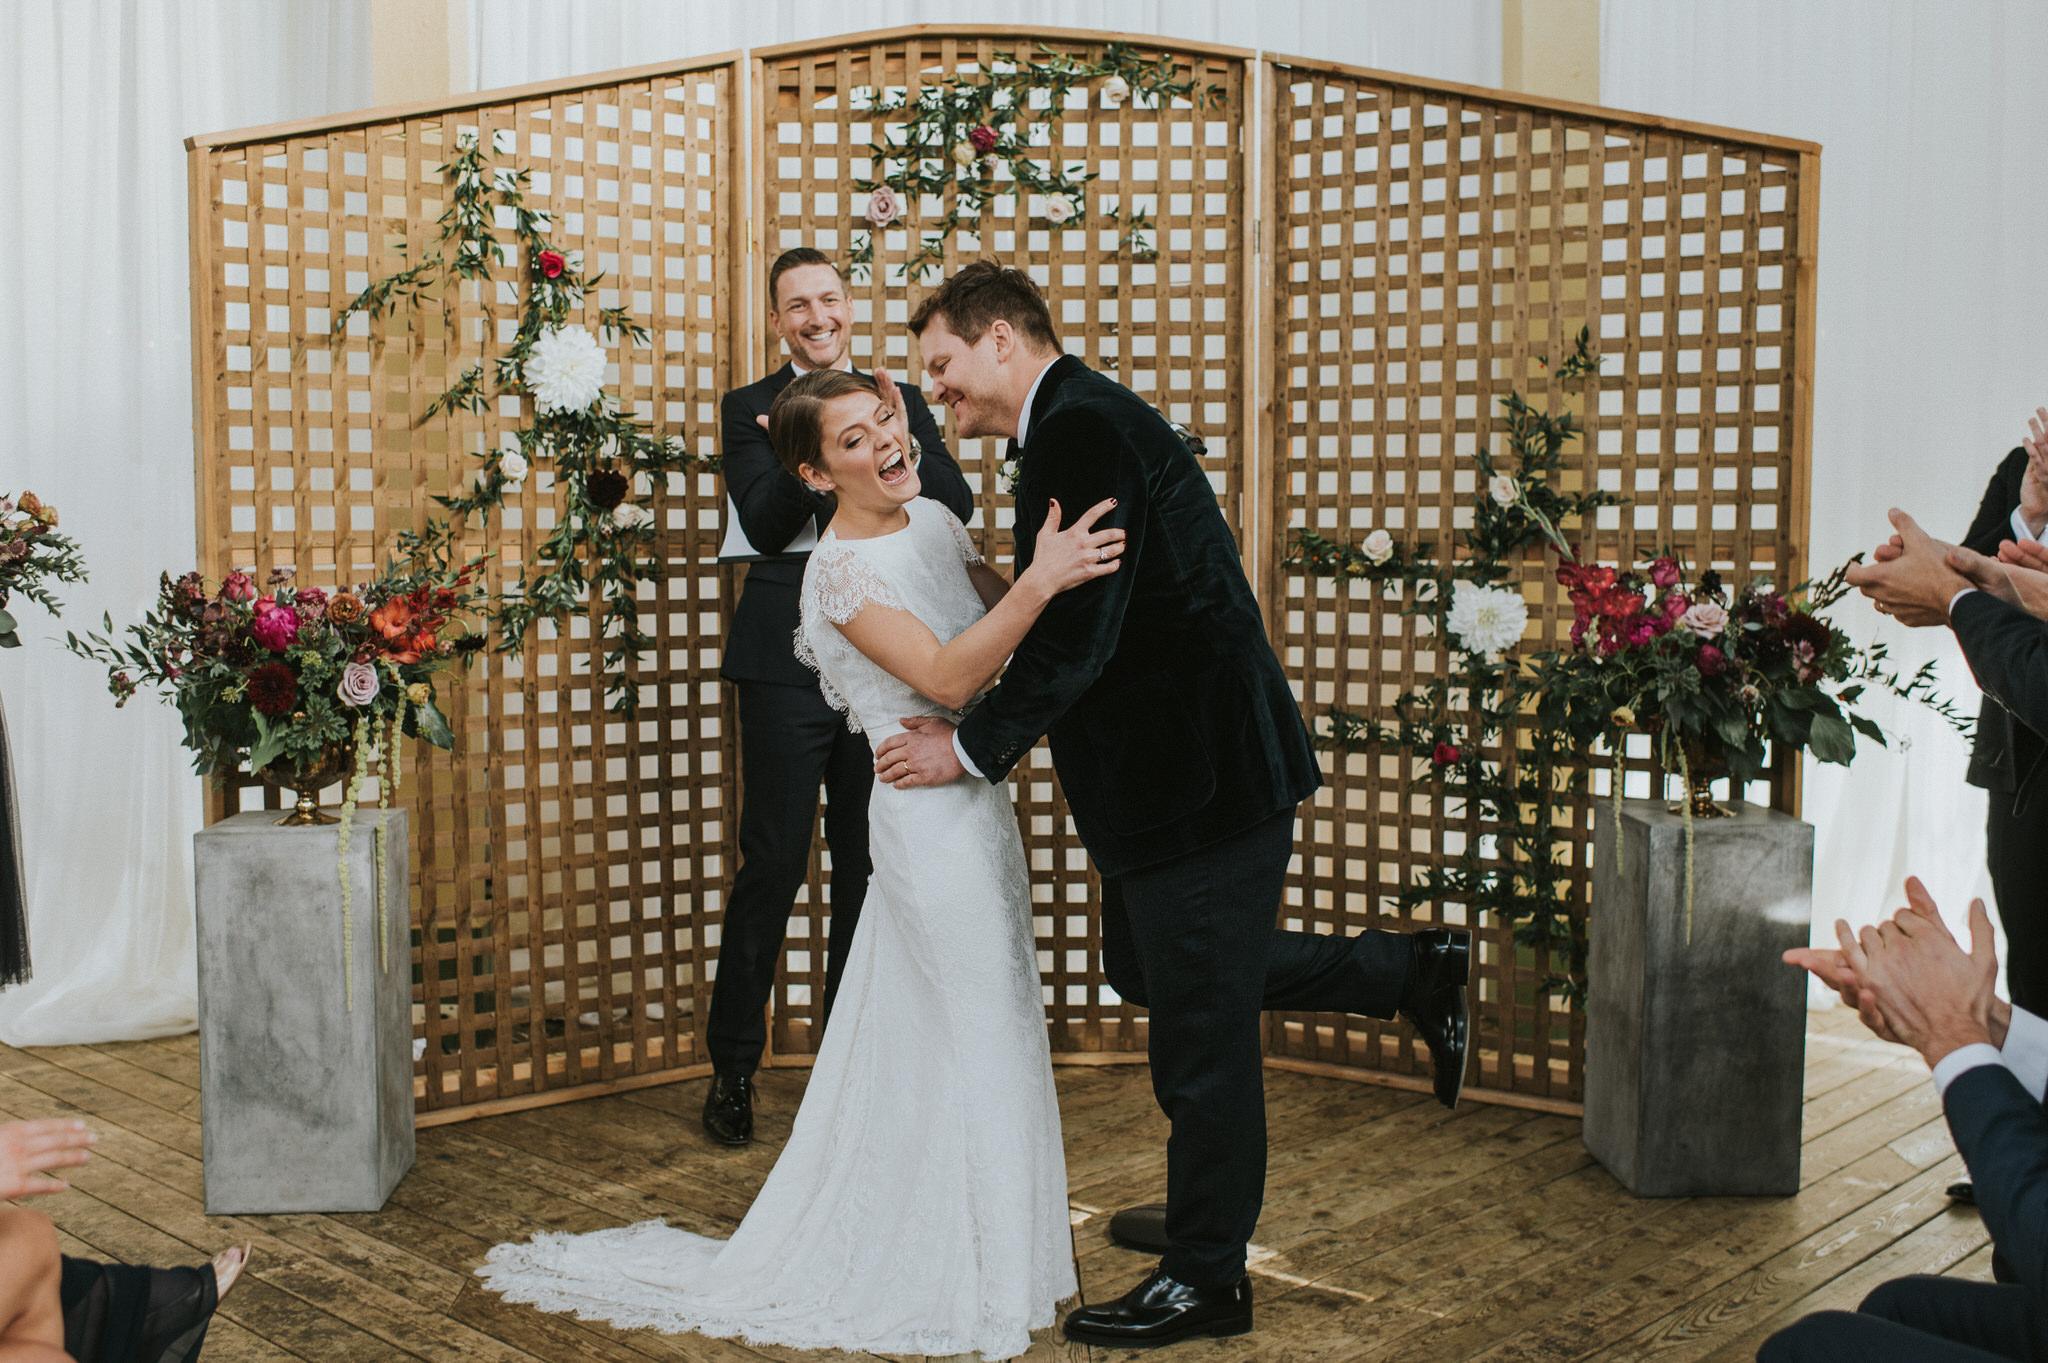 scarletoneillphotography_weddingphotography_prince edward county weddings120.JPG